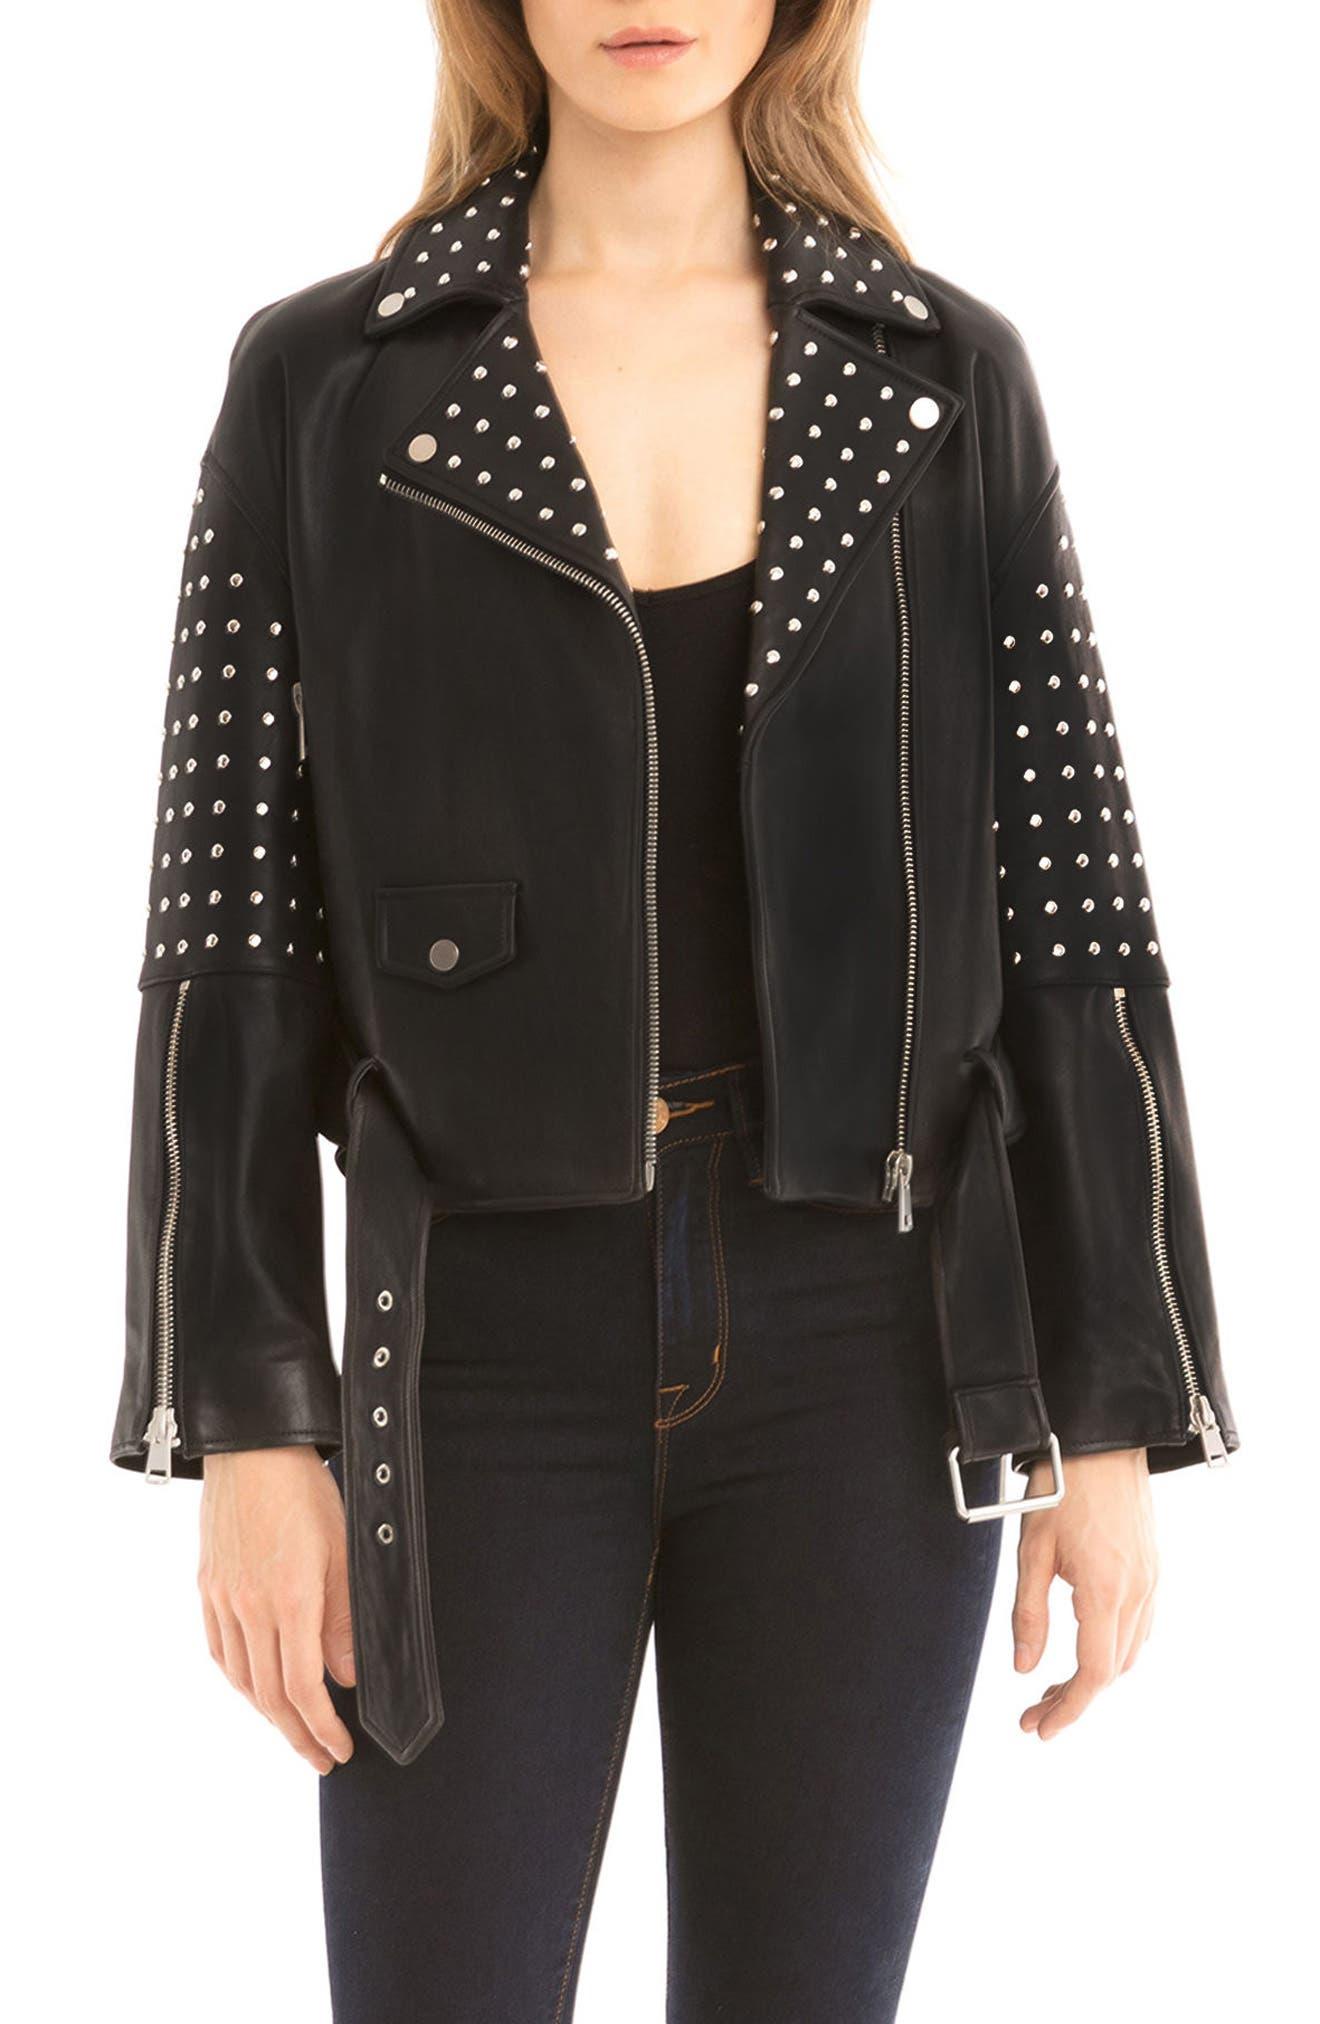 Bagatelle Studded Leather Jacket,                             Main thumbnail 1, color,                             Black